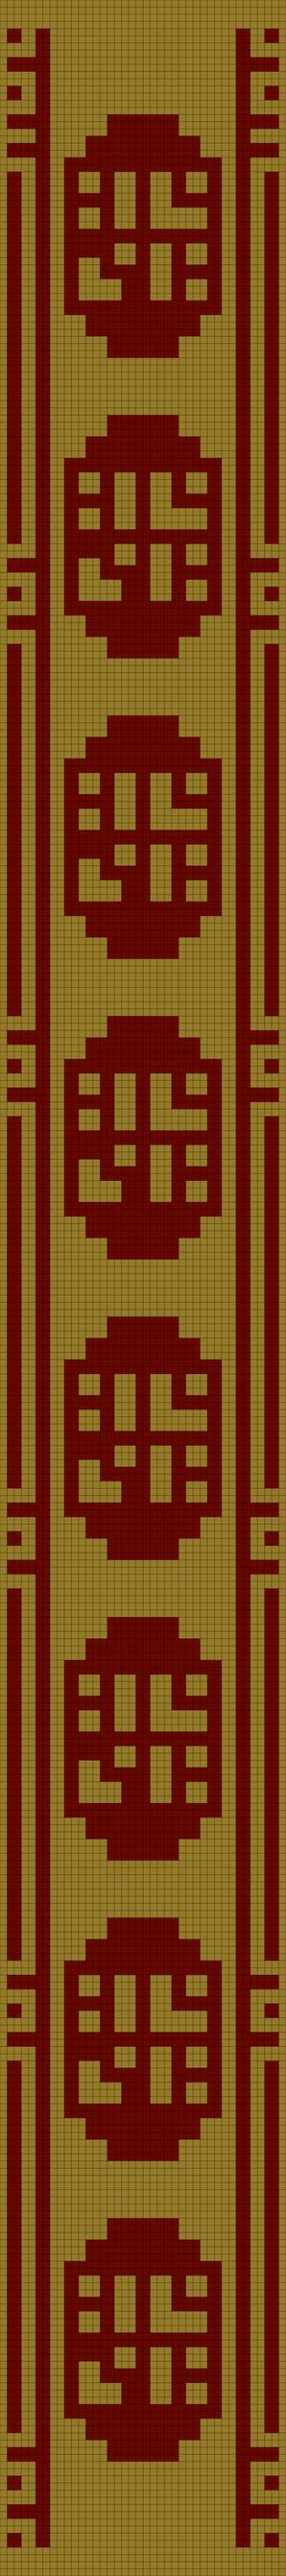 Journey Scarf Pattern (double knitting) by Yodaman921 on DeviantArt